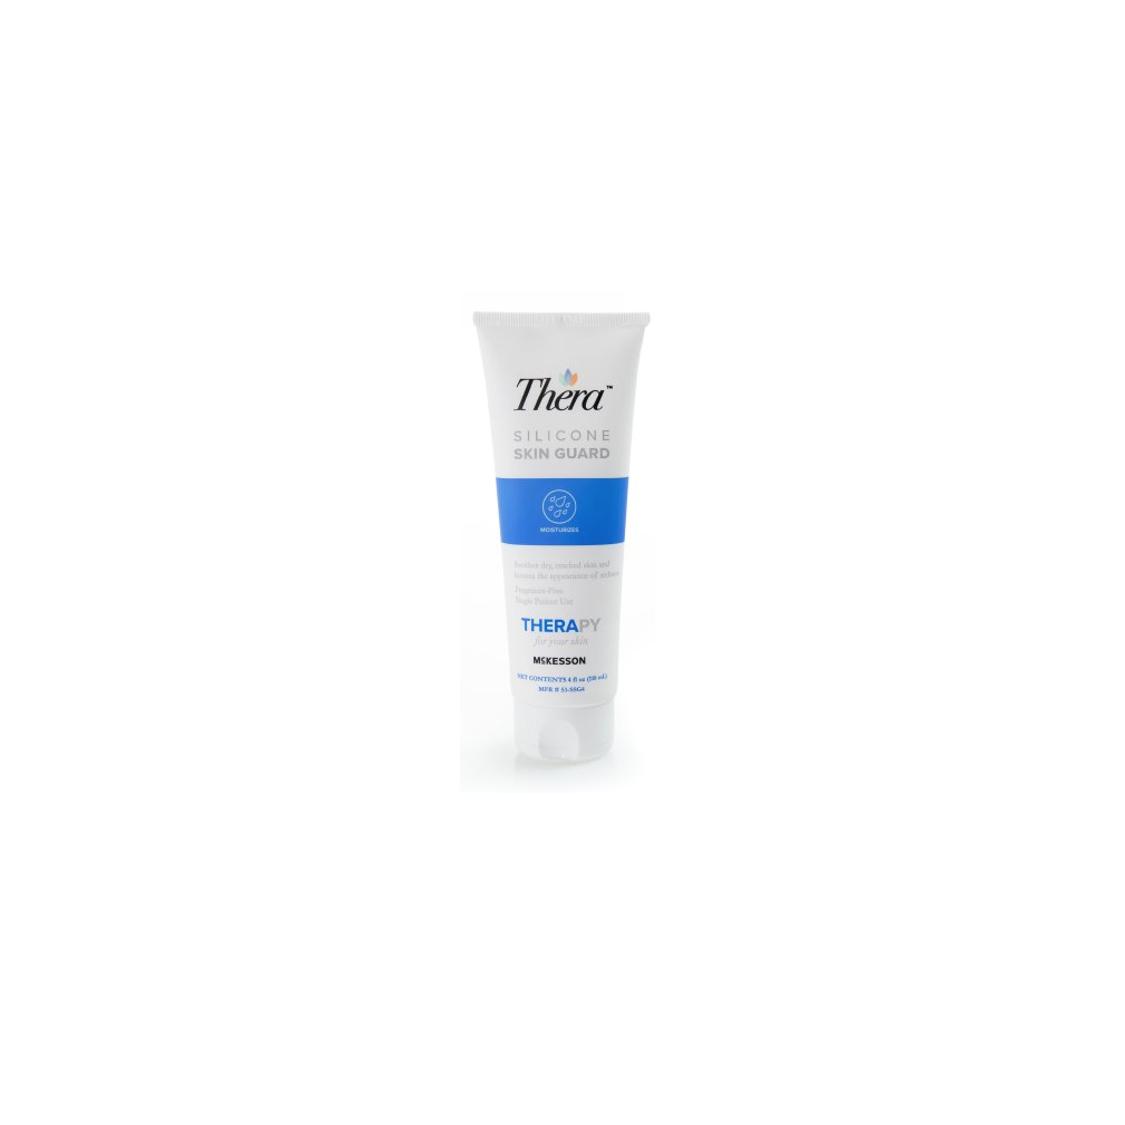 Skin Protectant Thera® Silicone Skin Guard 4 oz. Tube Unscented Cream